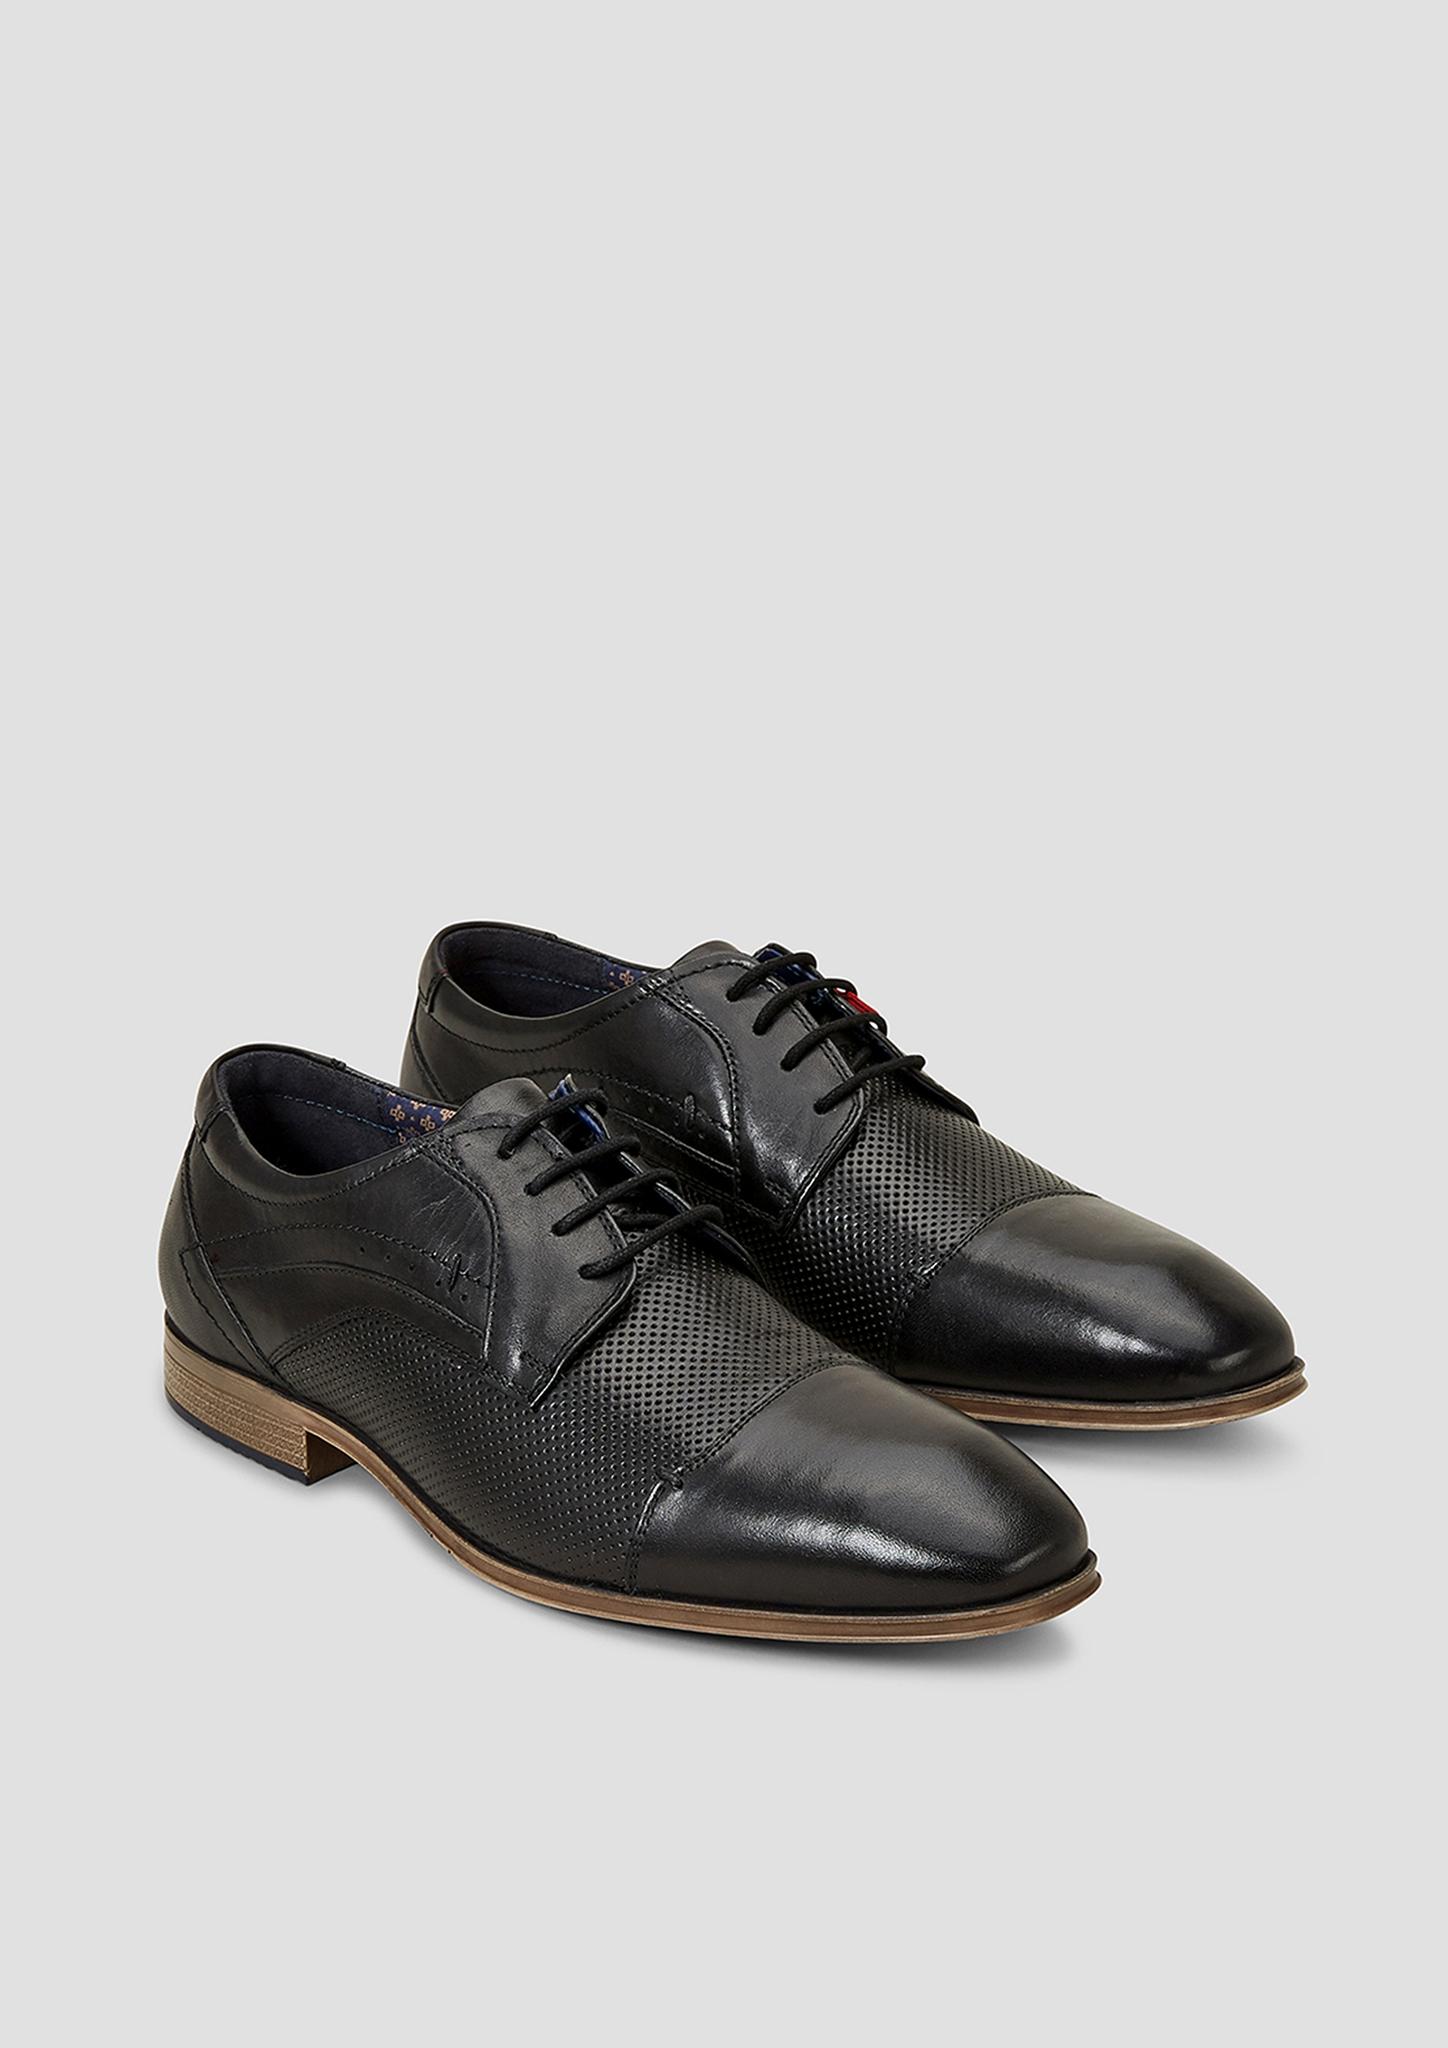 Leder-Halbschuhe | Schuhe > Boots > Boots | Schwarz | Obermaterial: leder| futter: textil| decksohle: textil| laufsohle: synthetik | s.Oliver